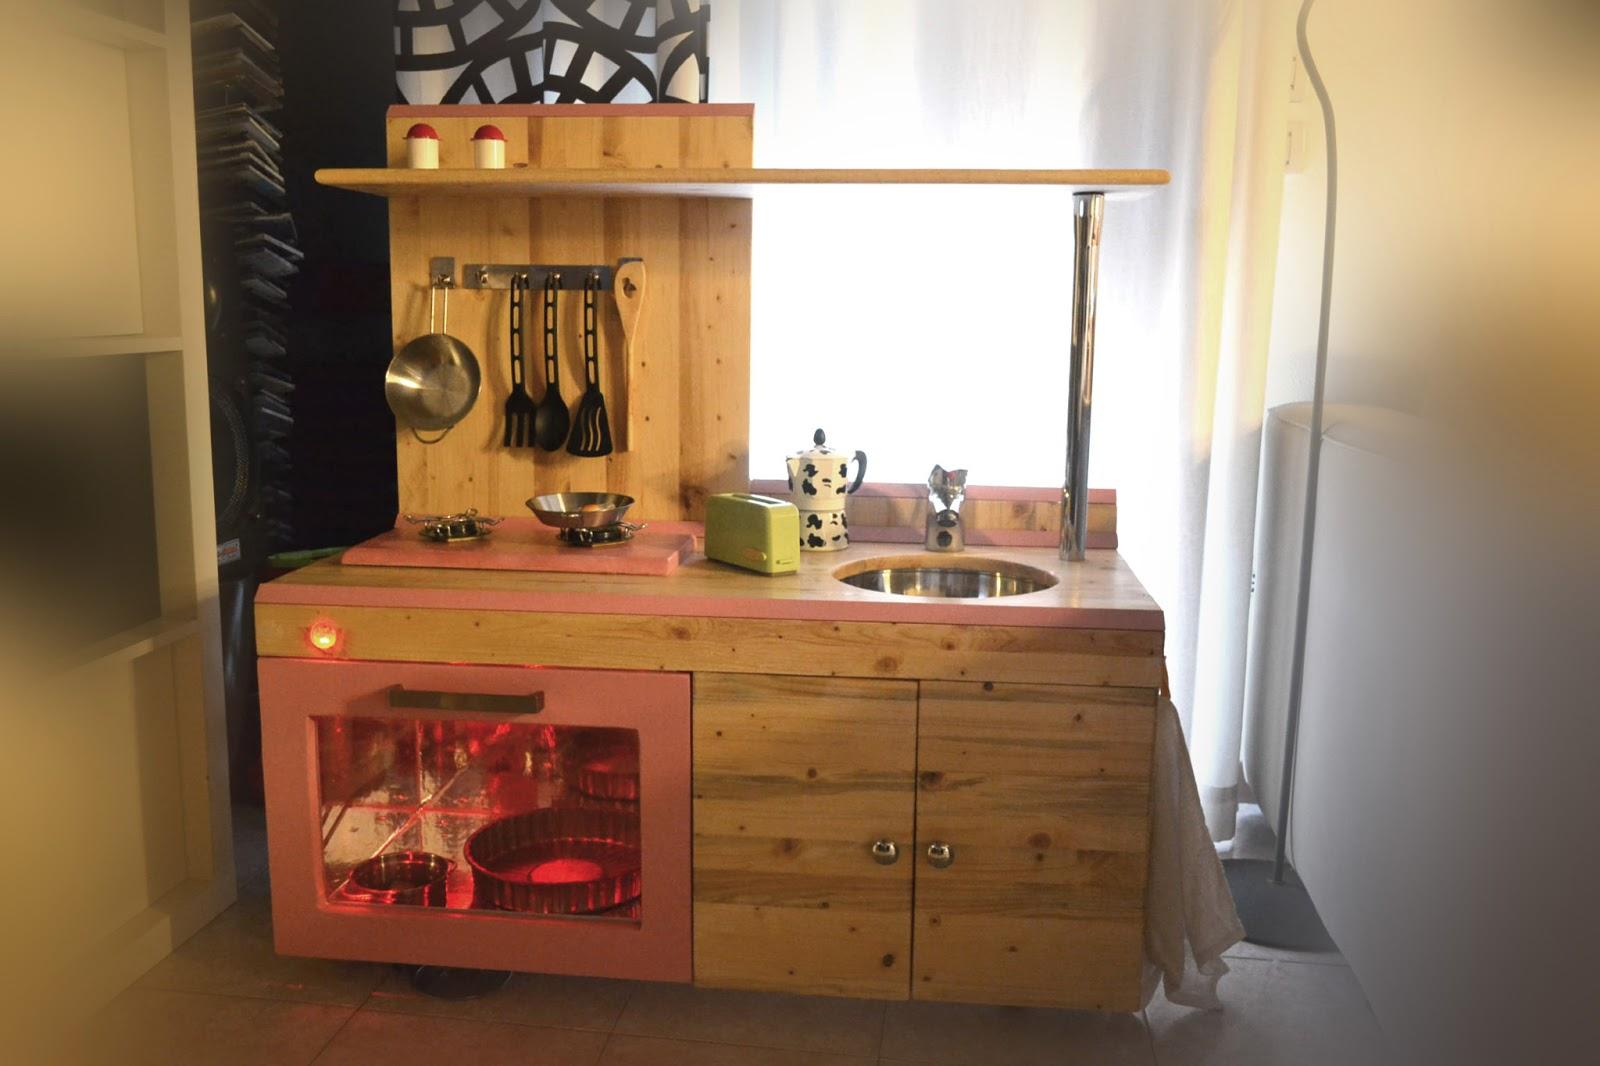 Cucina X Bambini Ikea | Awesome Ikea Cucina Bambini Ideas House ...